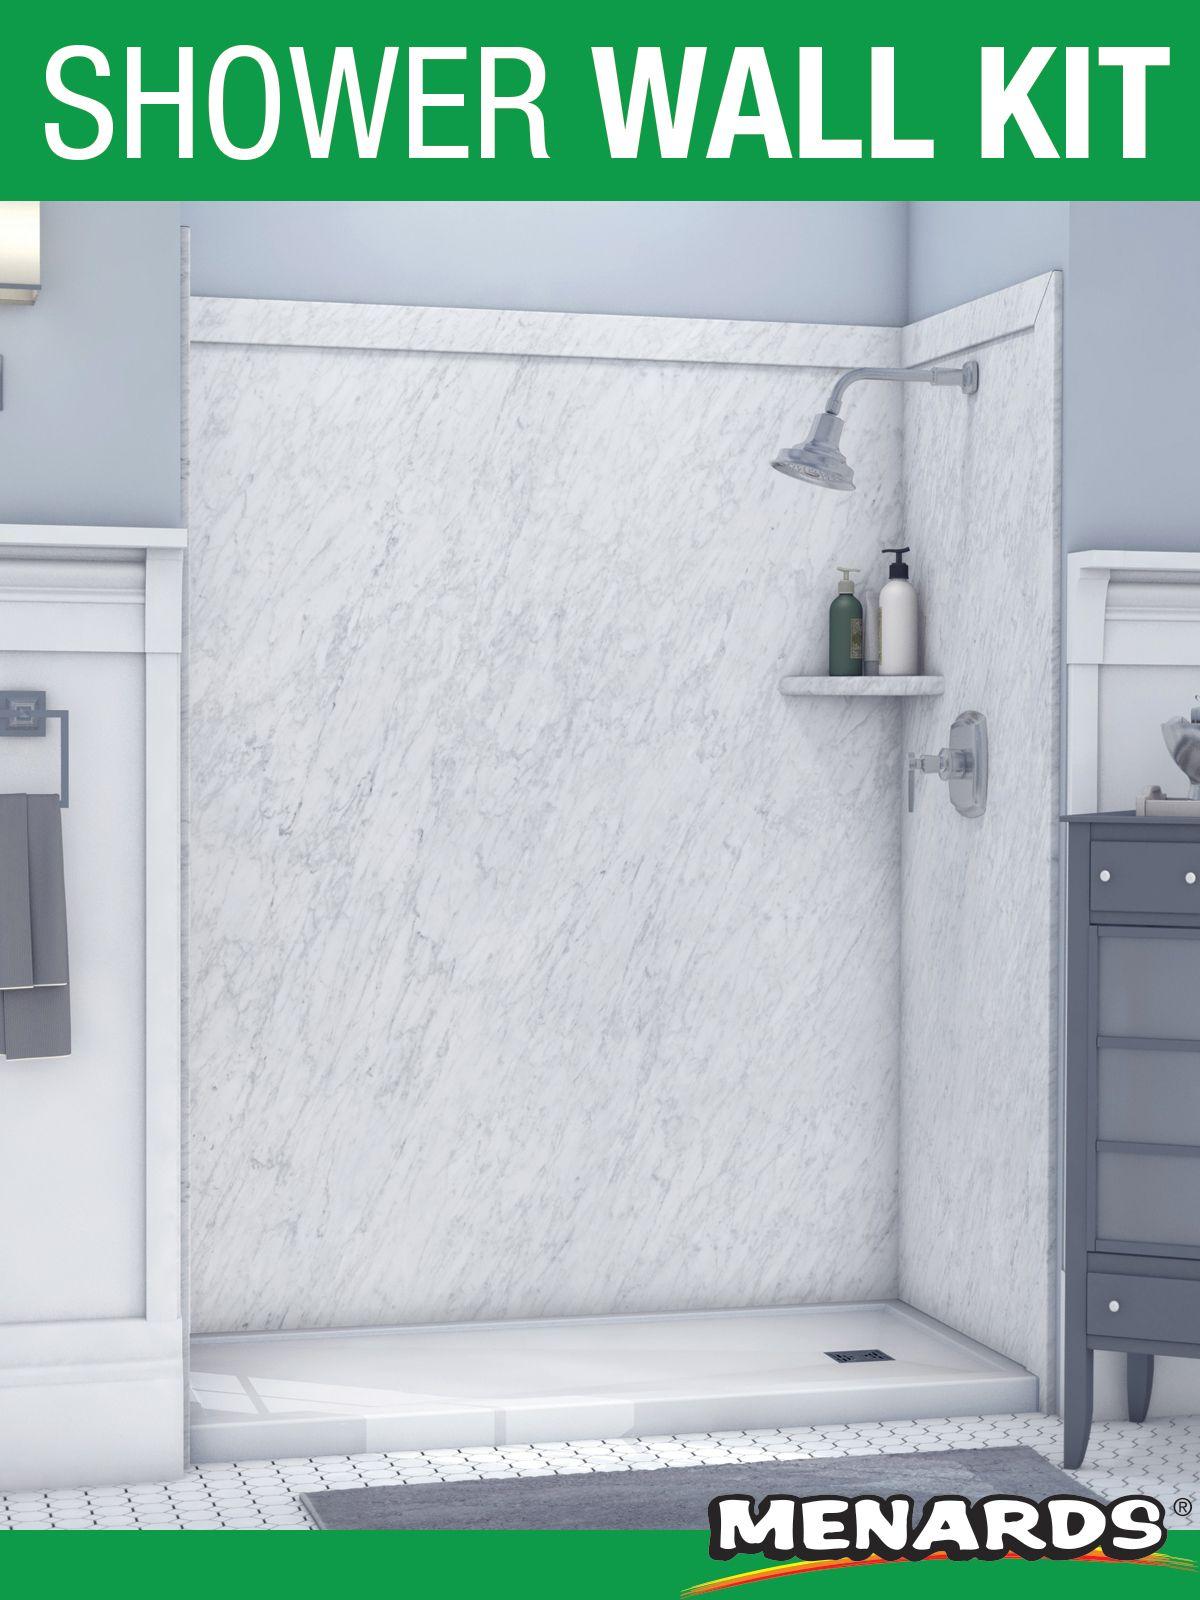 Flexstone Royale 60 X 36 Frost Bathtub Shower Wall Surround In 2020 Shower Wall Shower Wall Kits Tub Surround